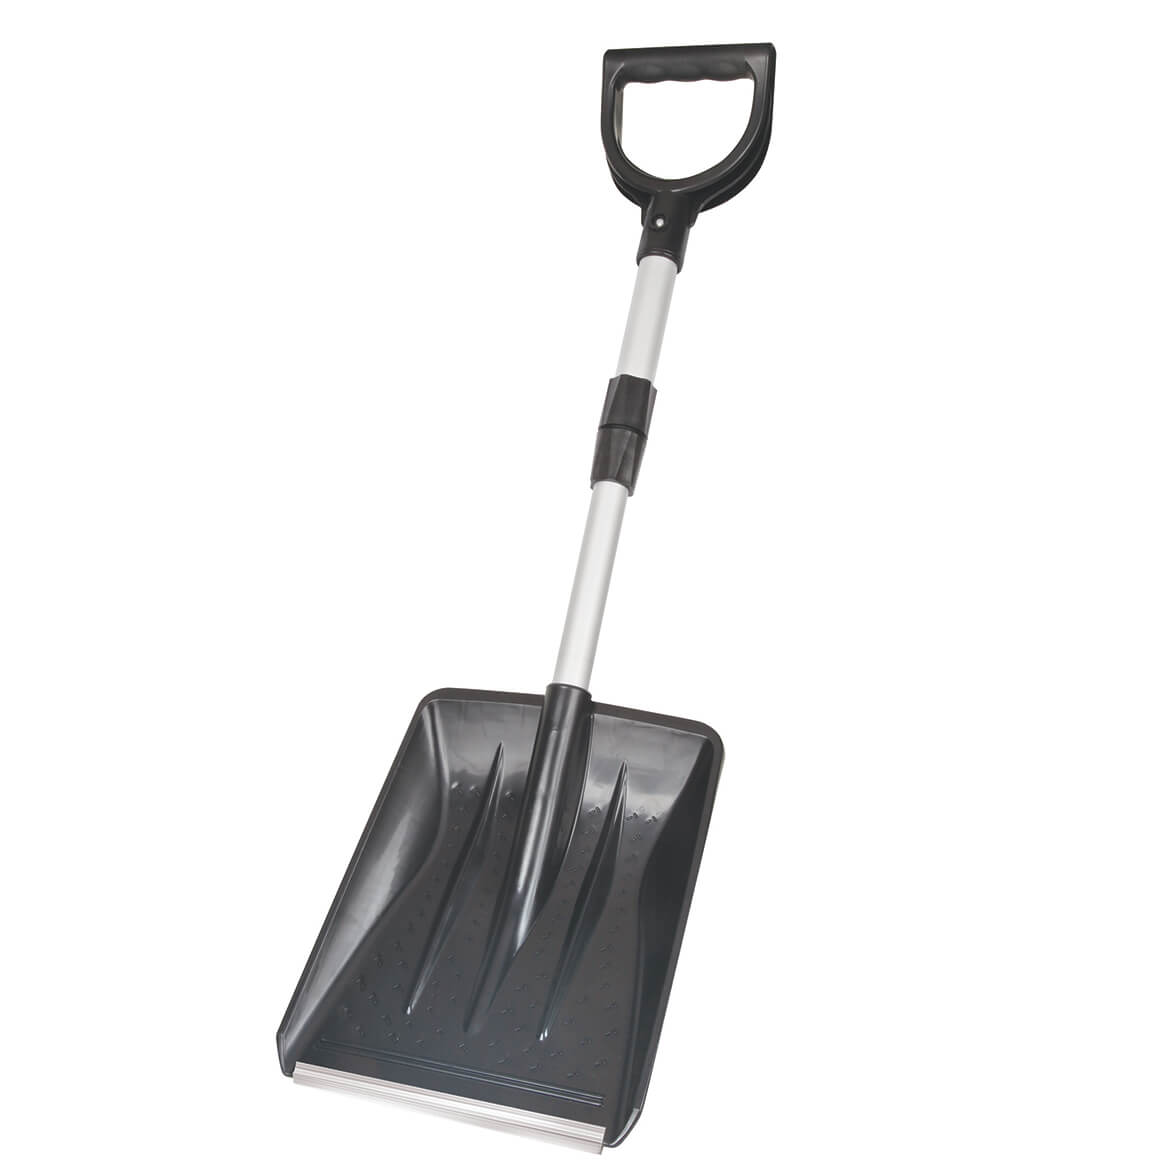 Telescoping Emergency Shovel-369825